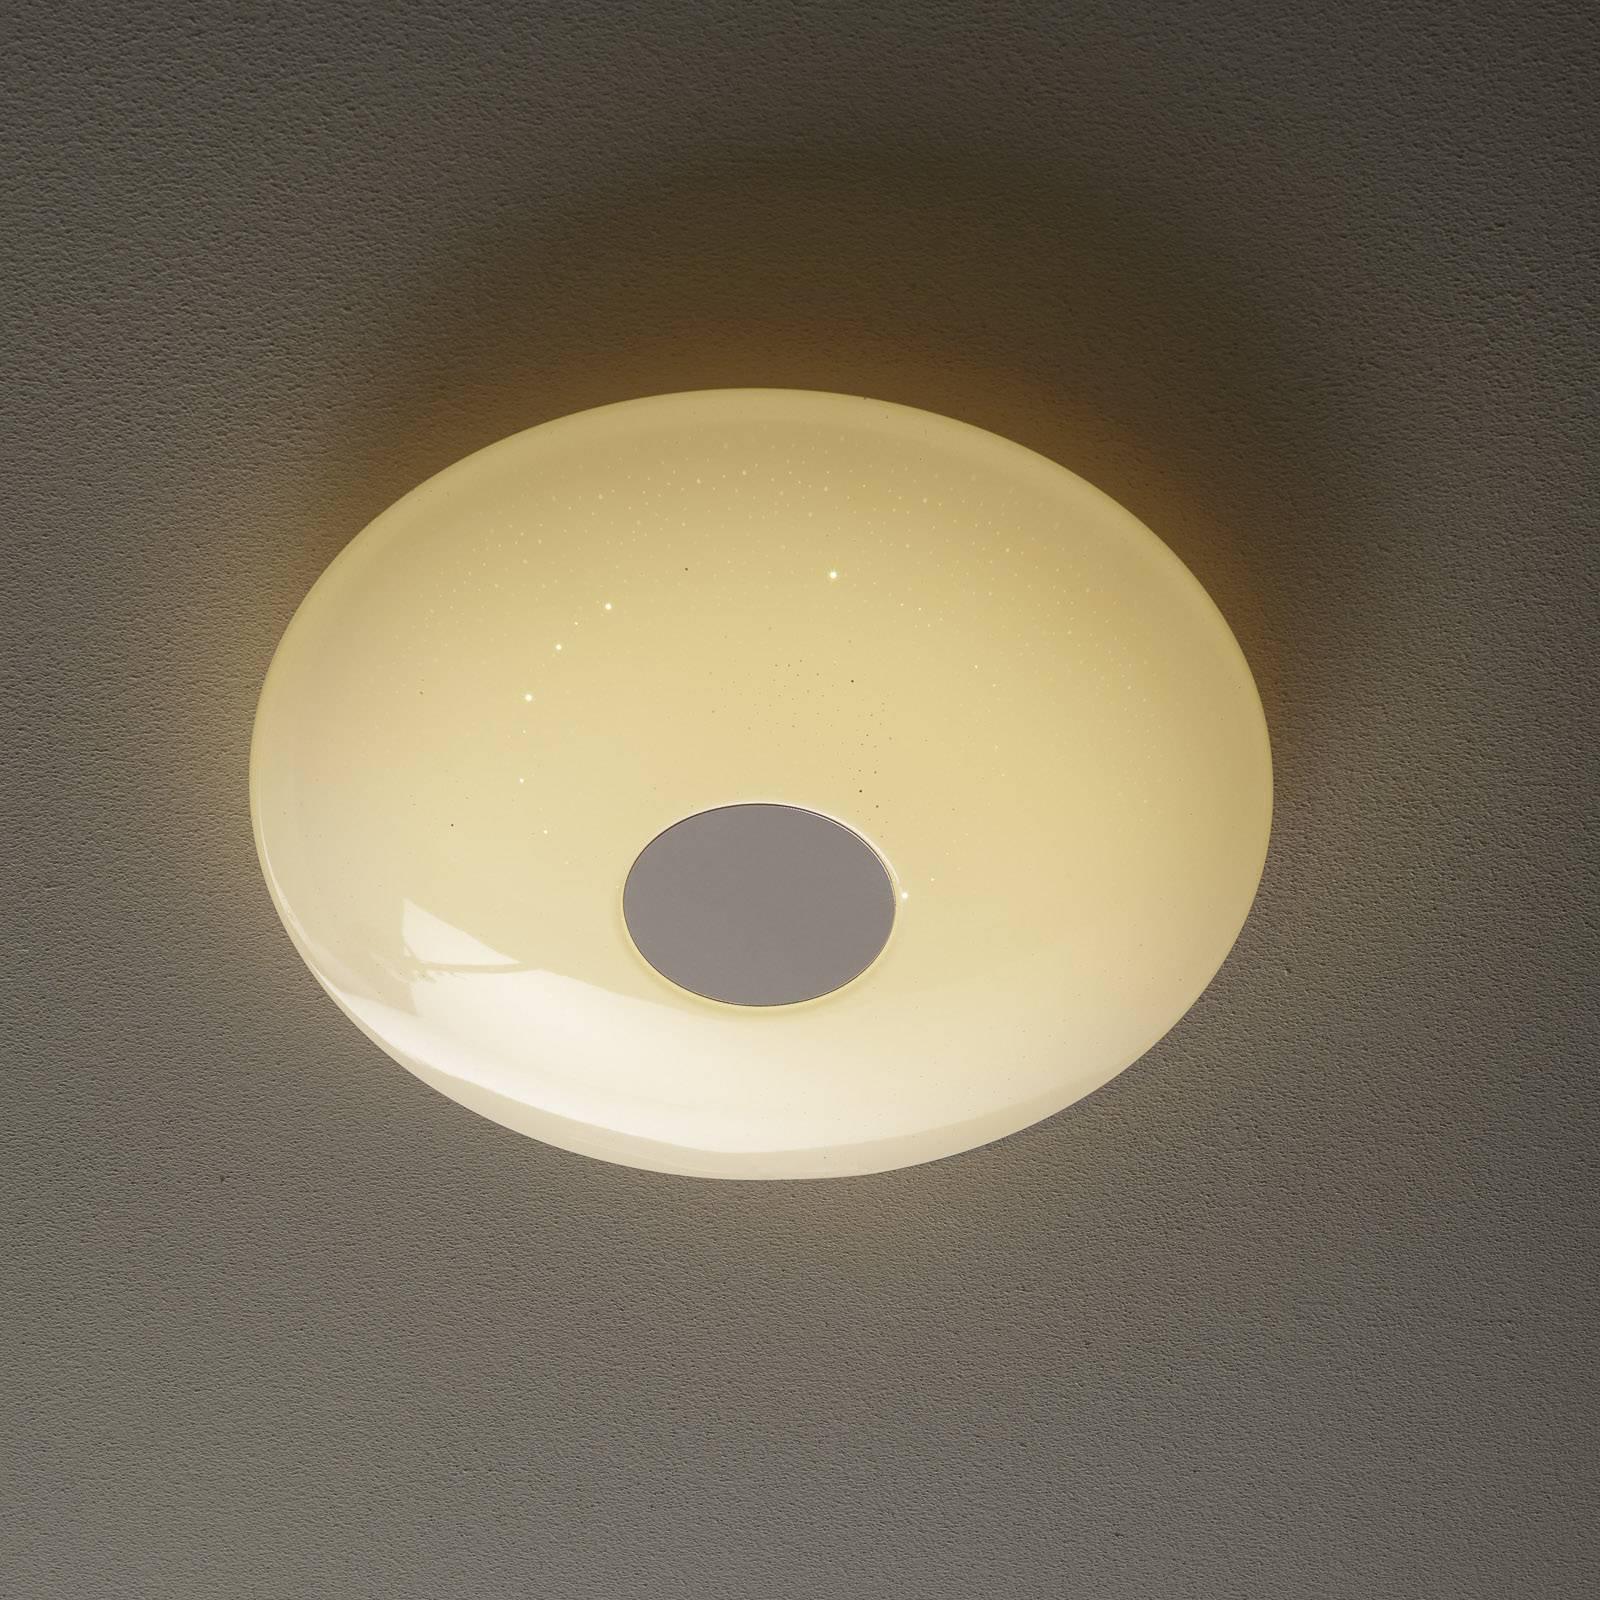 Eglo Connect Voltage-C LED-taklampe rund hvit